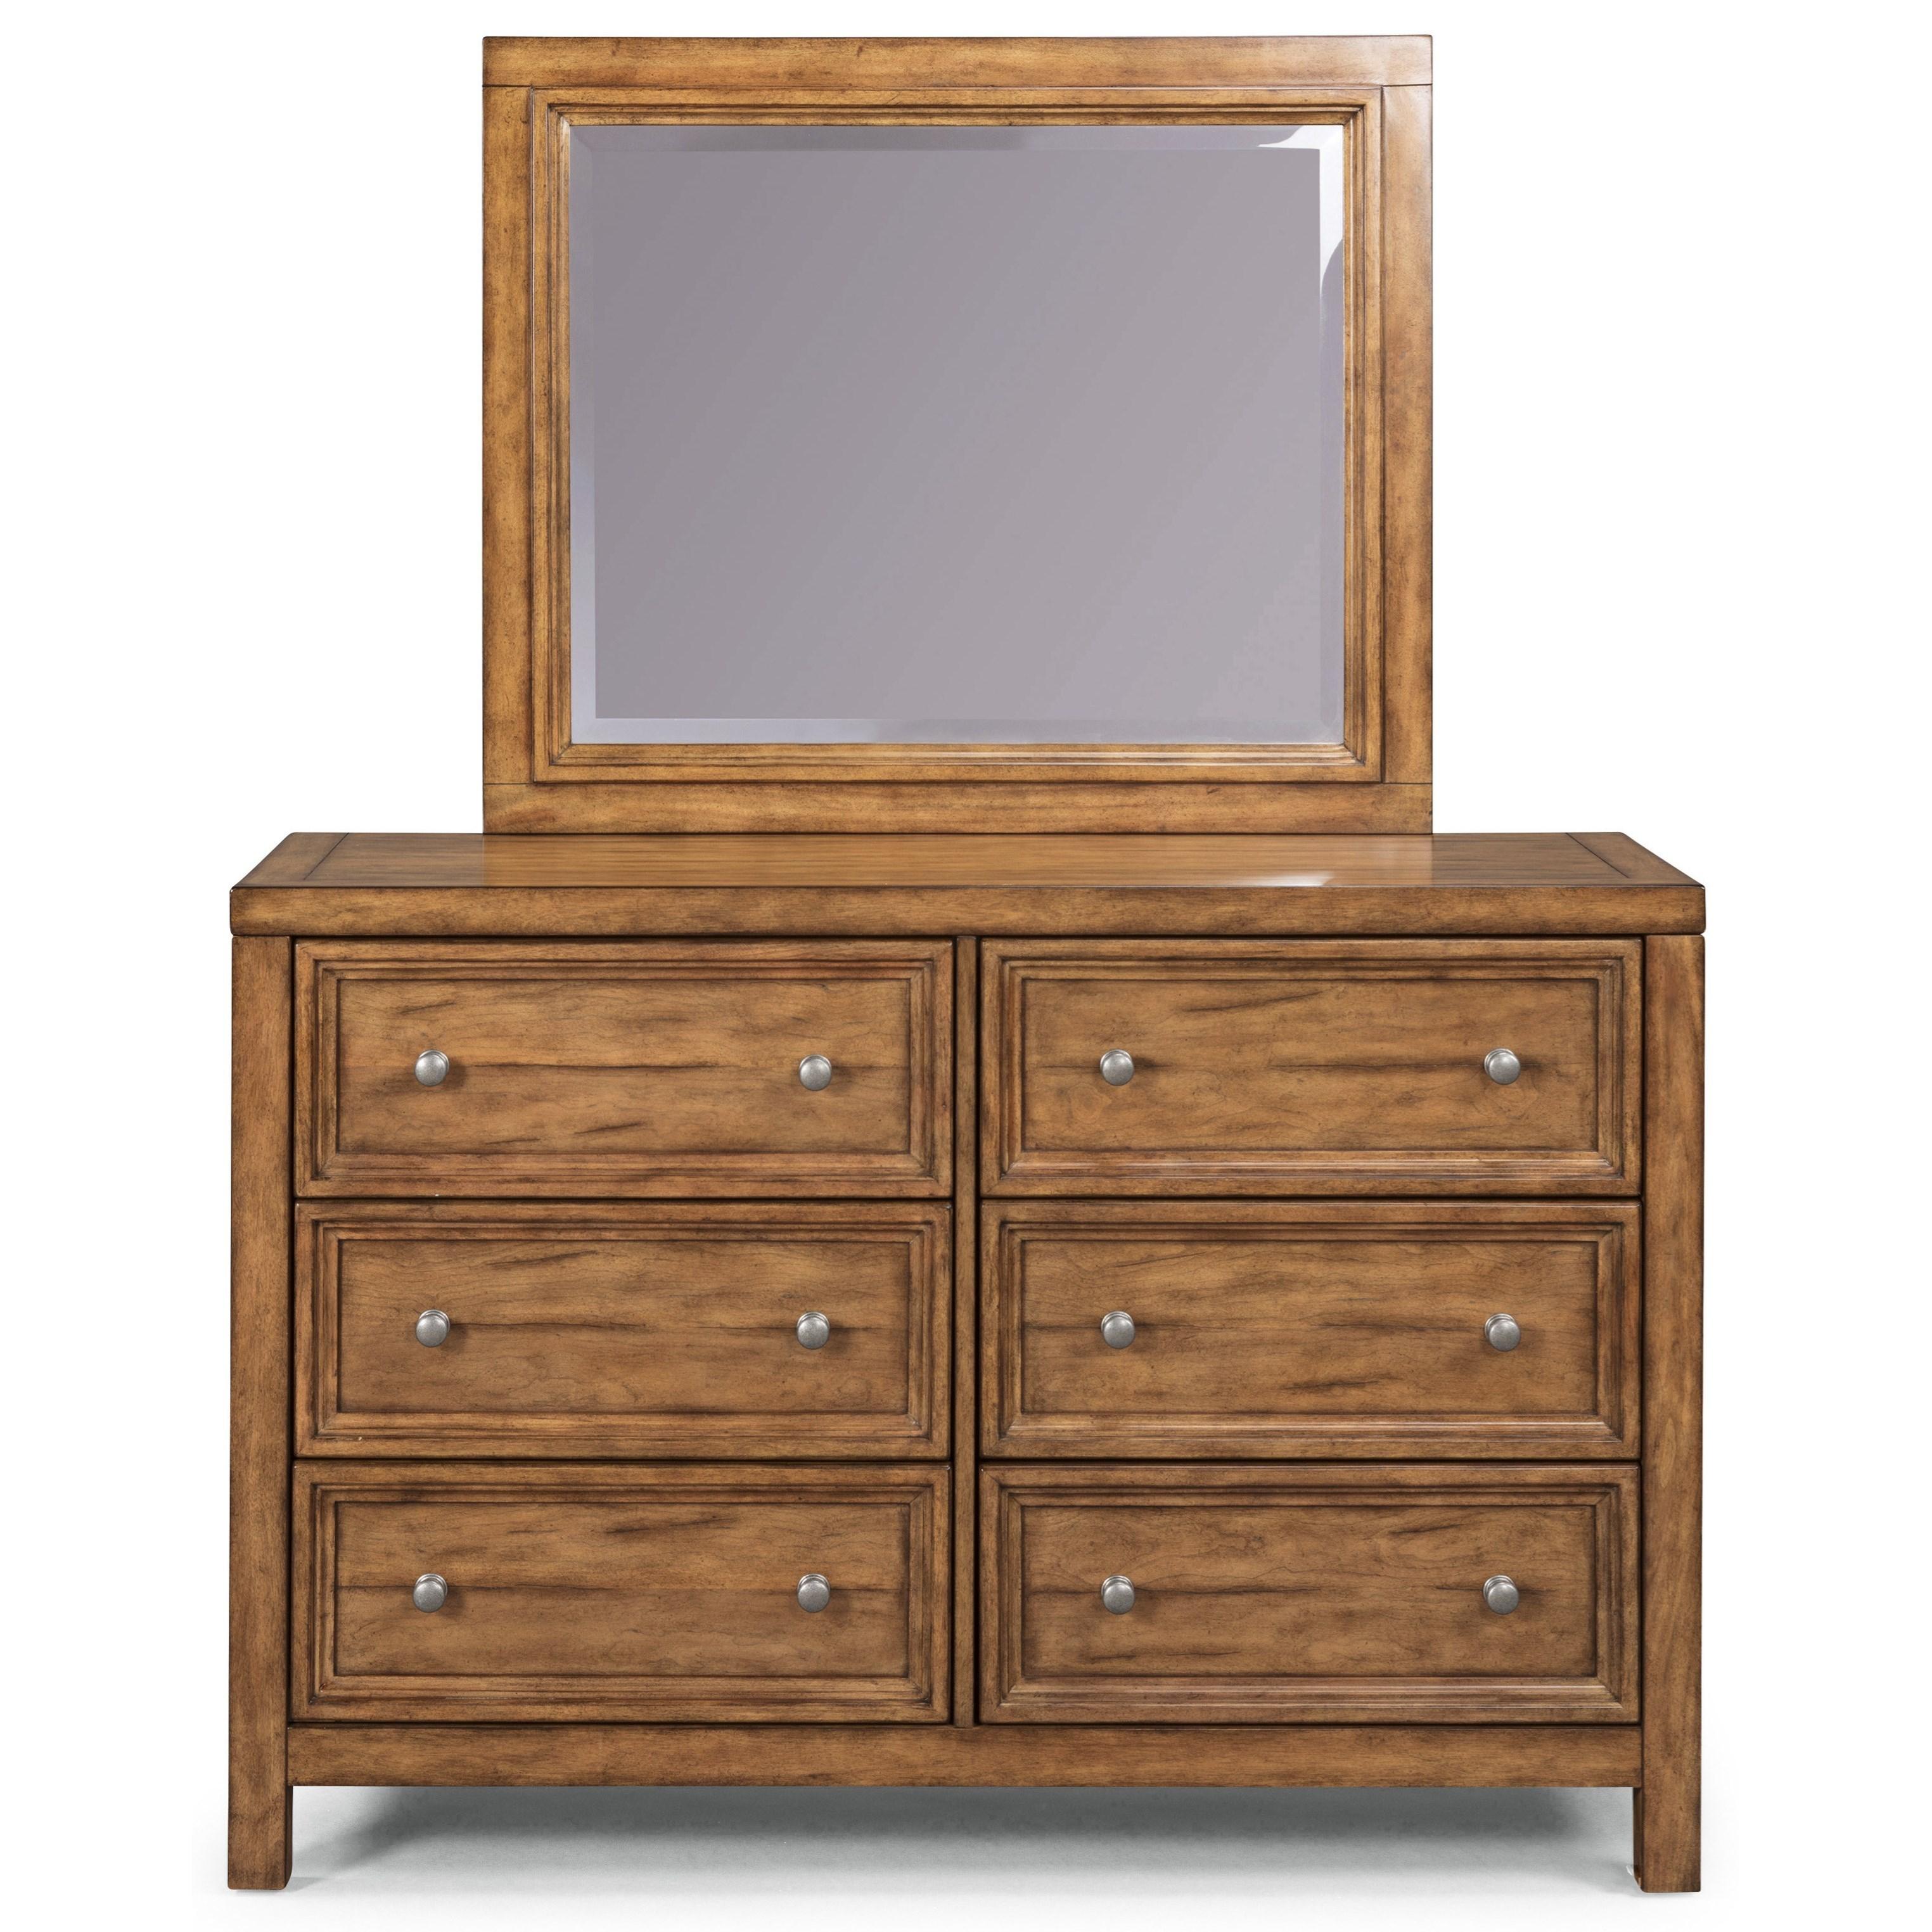 Sedona Dresser & Mirror by homestyles at Sam Levitz Outlet